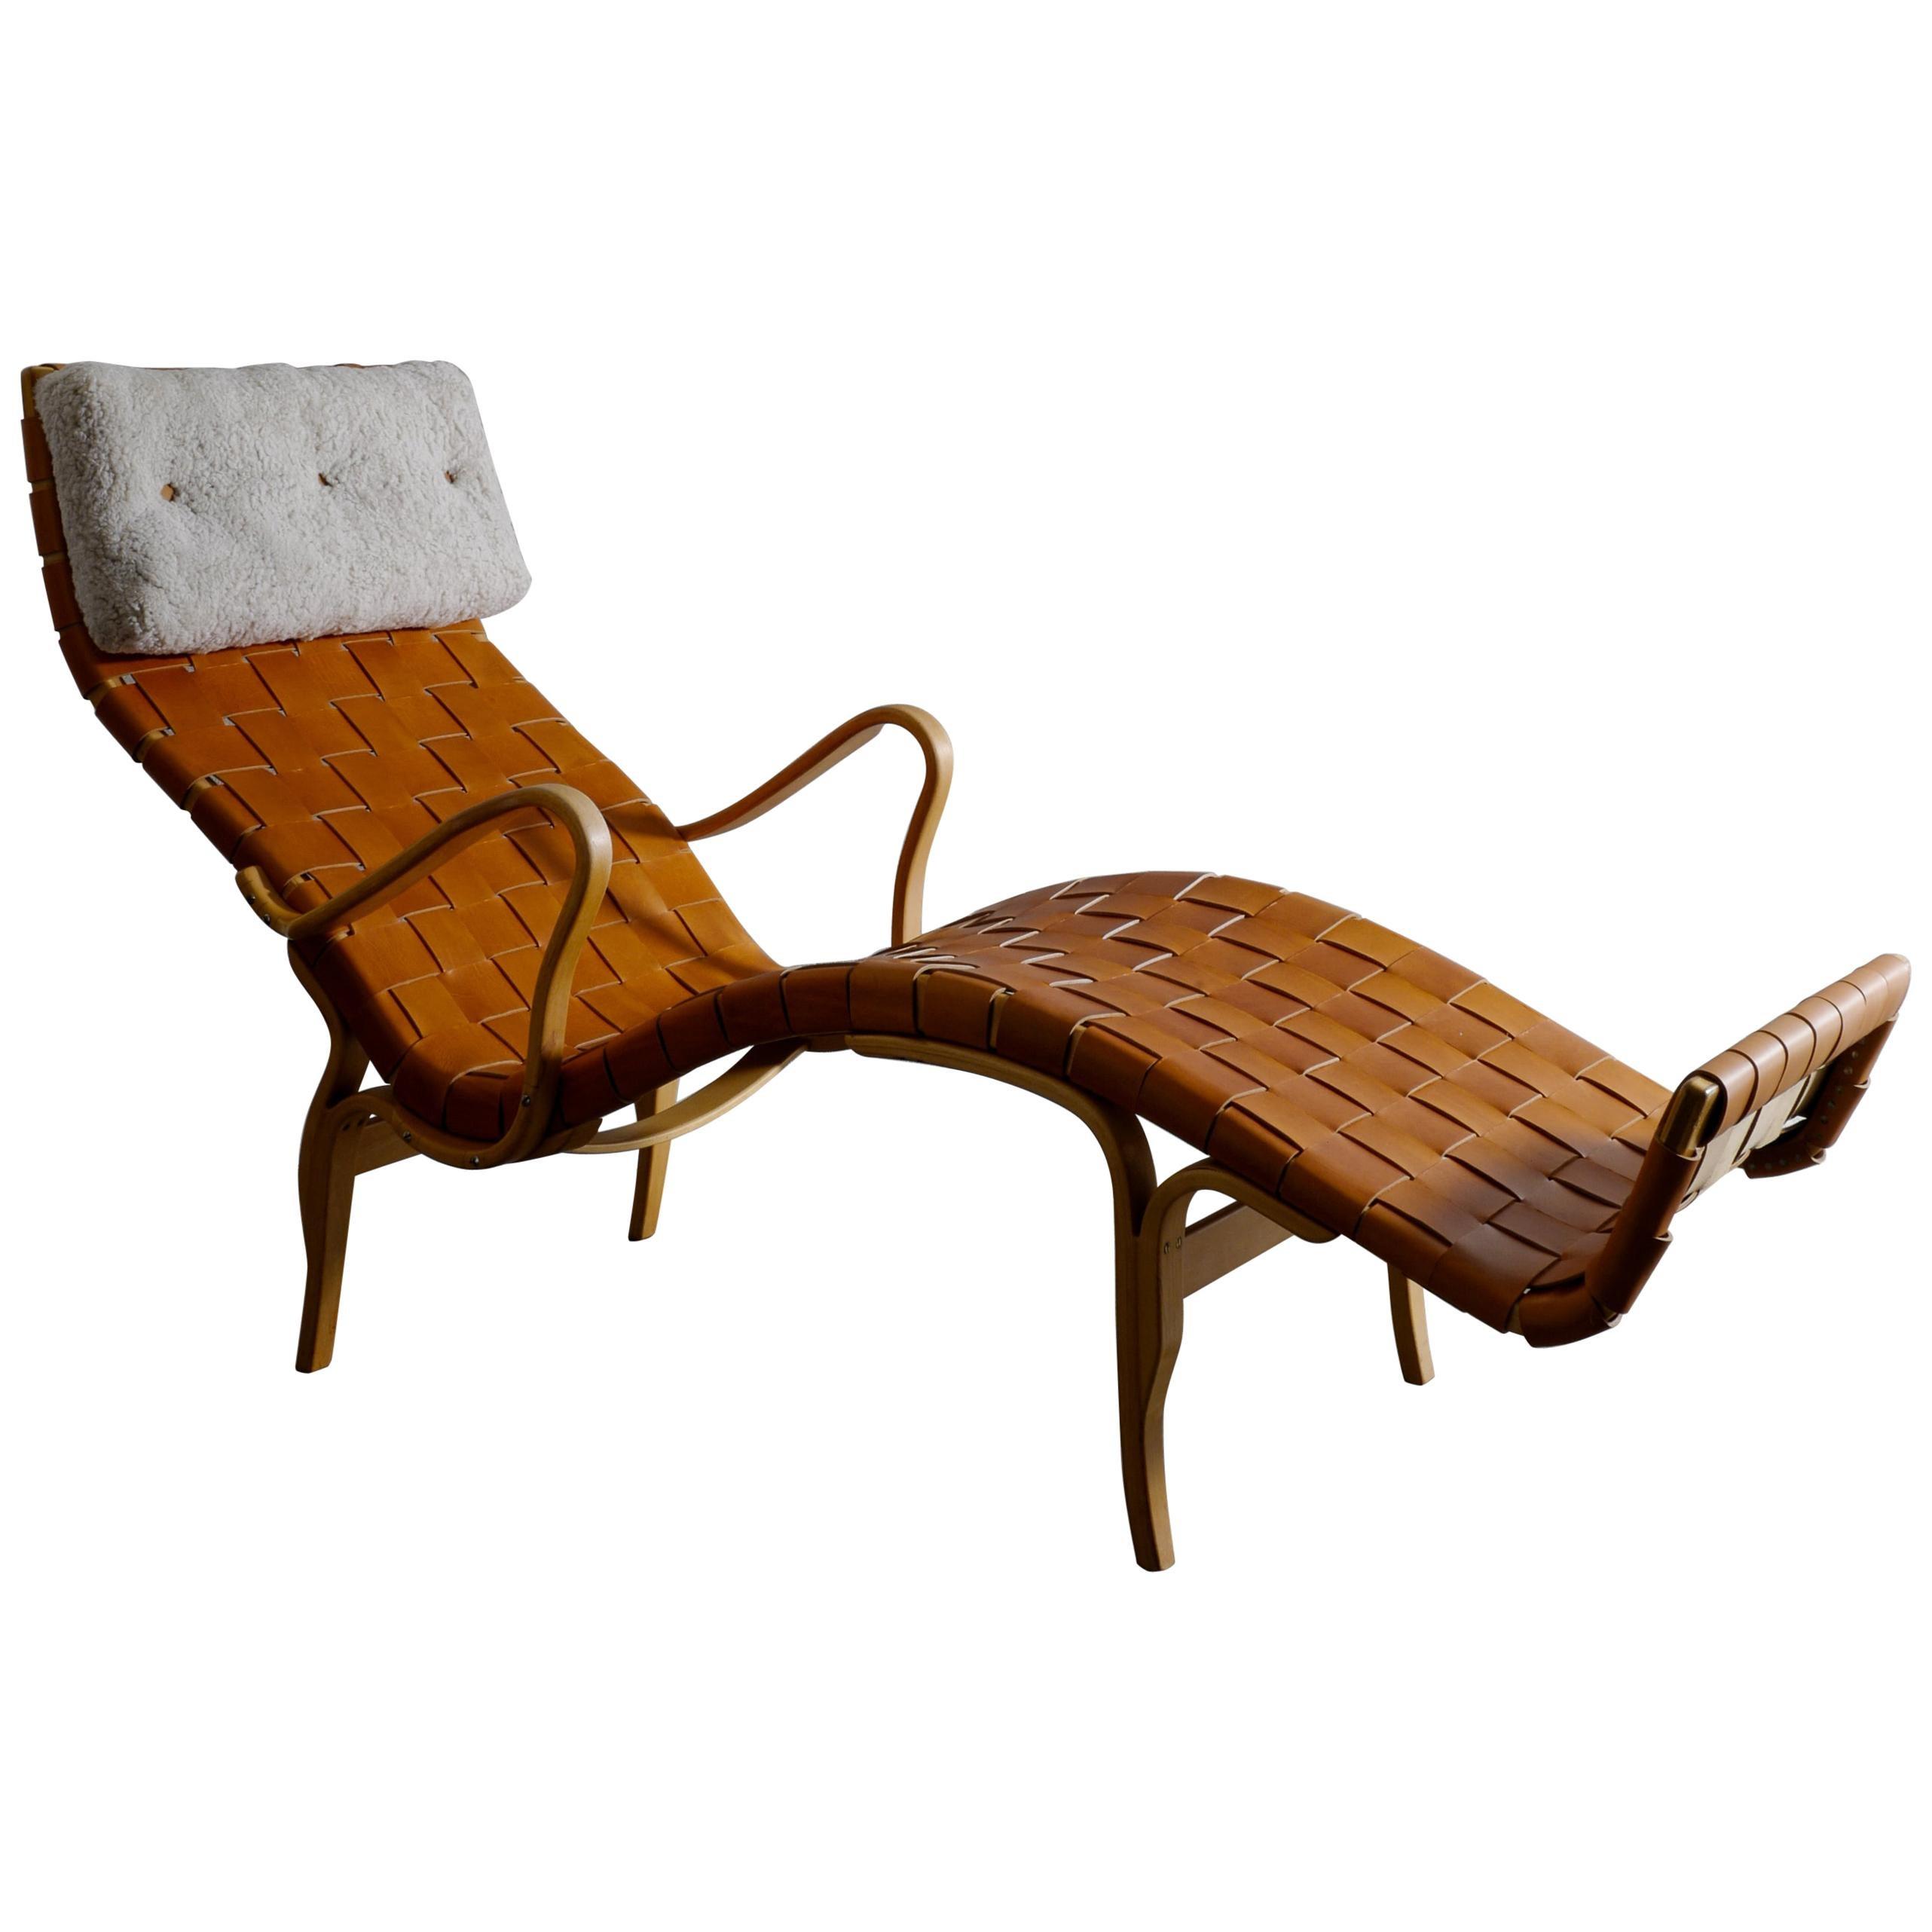 "Bruno Mathsson ""Pernilla 3"" Lounge Chair in Leather and Sheepskin Swedish, 1970s"